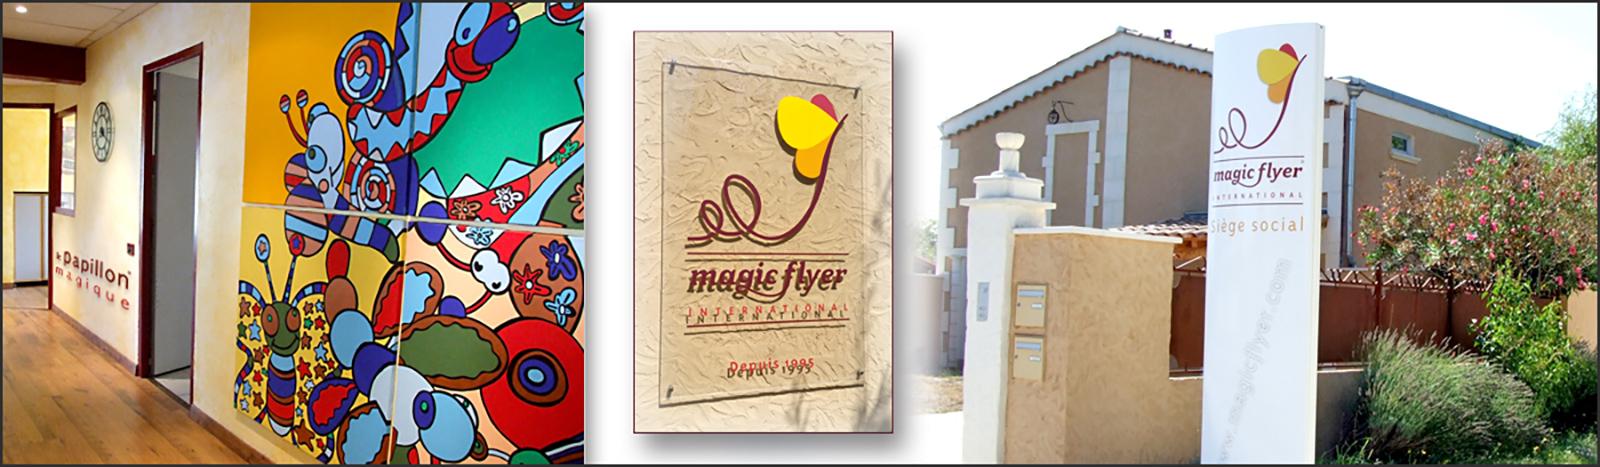 Magic Flyer International, Magic Butterfly